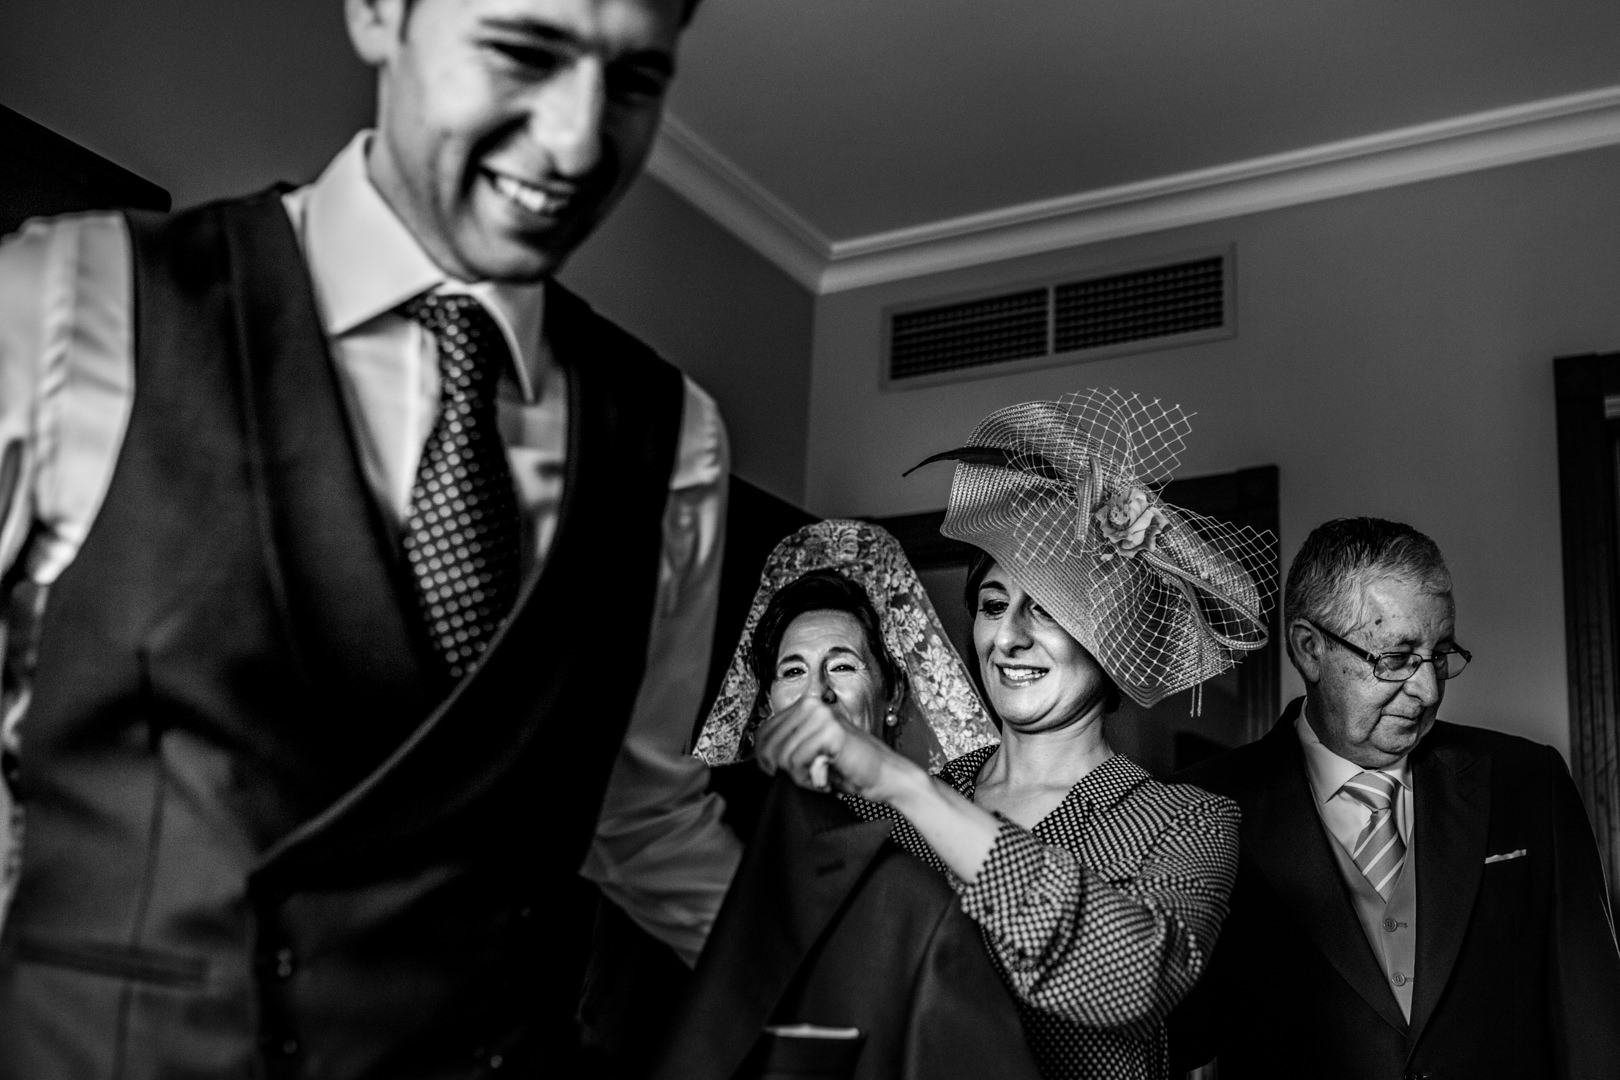 Boda-Catedral-Jaen-Hamburgo-Maria-David-engagement-Rafael-Torres-fotografo-bodas-sevilla-madrid-barcelona-wedding-photographer--8.jpg